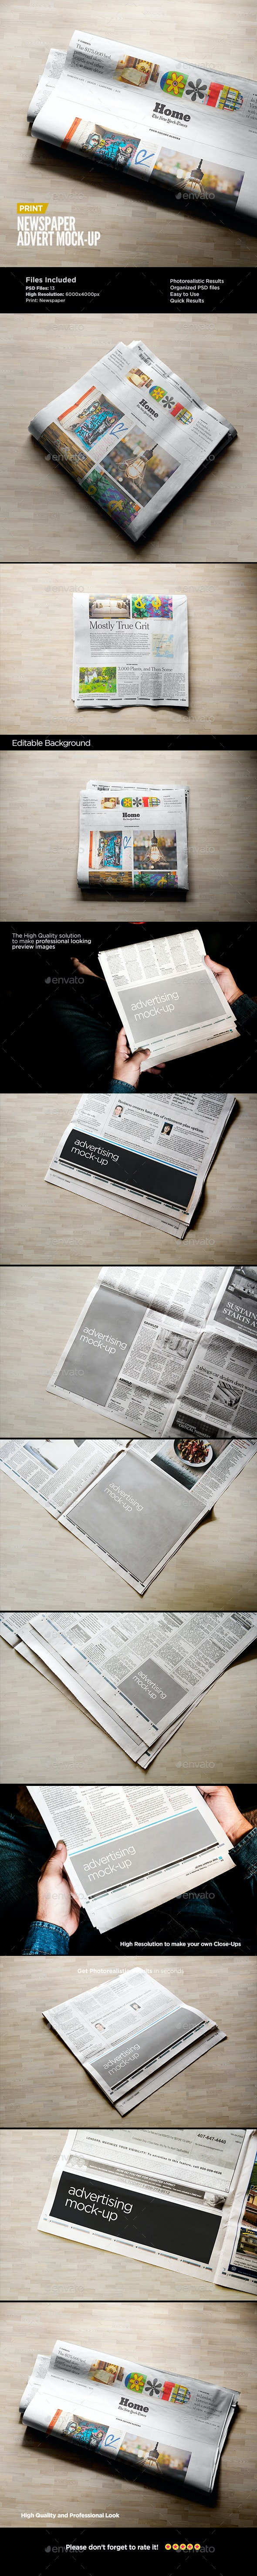 Newspaper Advert Mock-Up - Miscellaneous Print